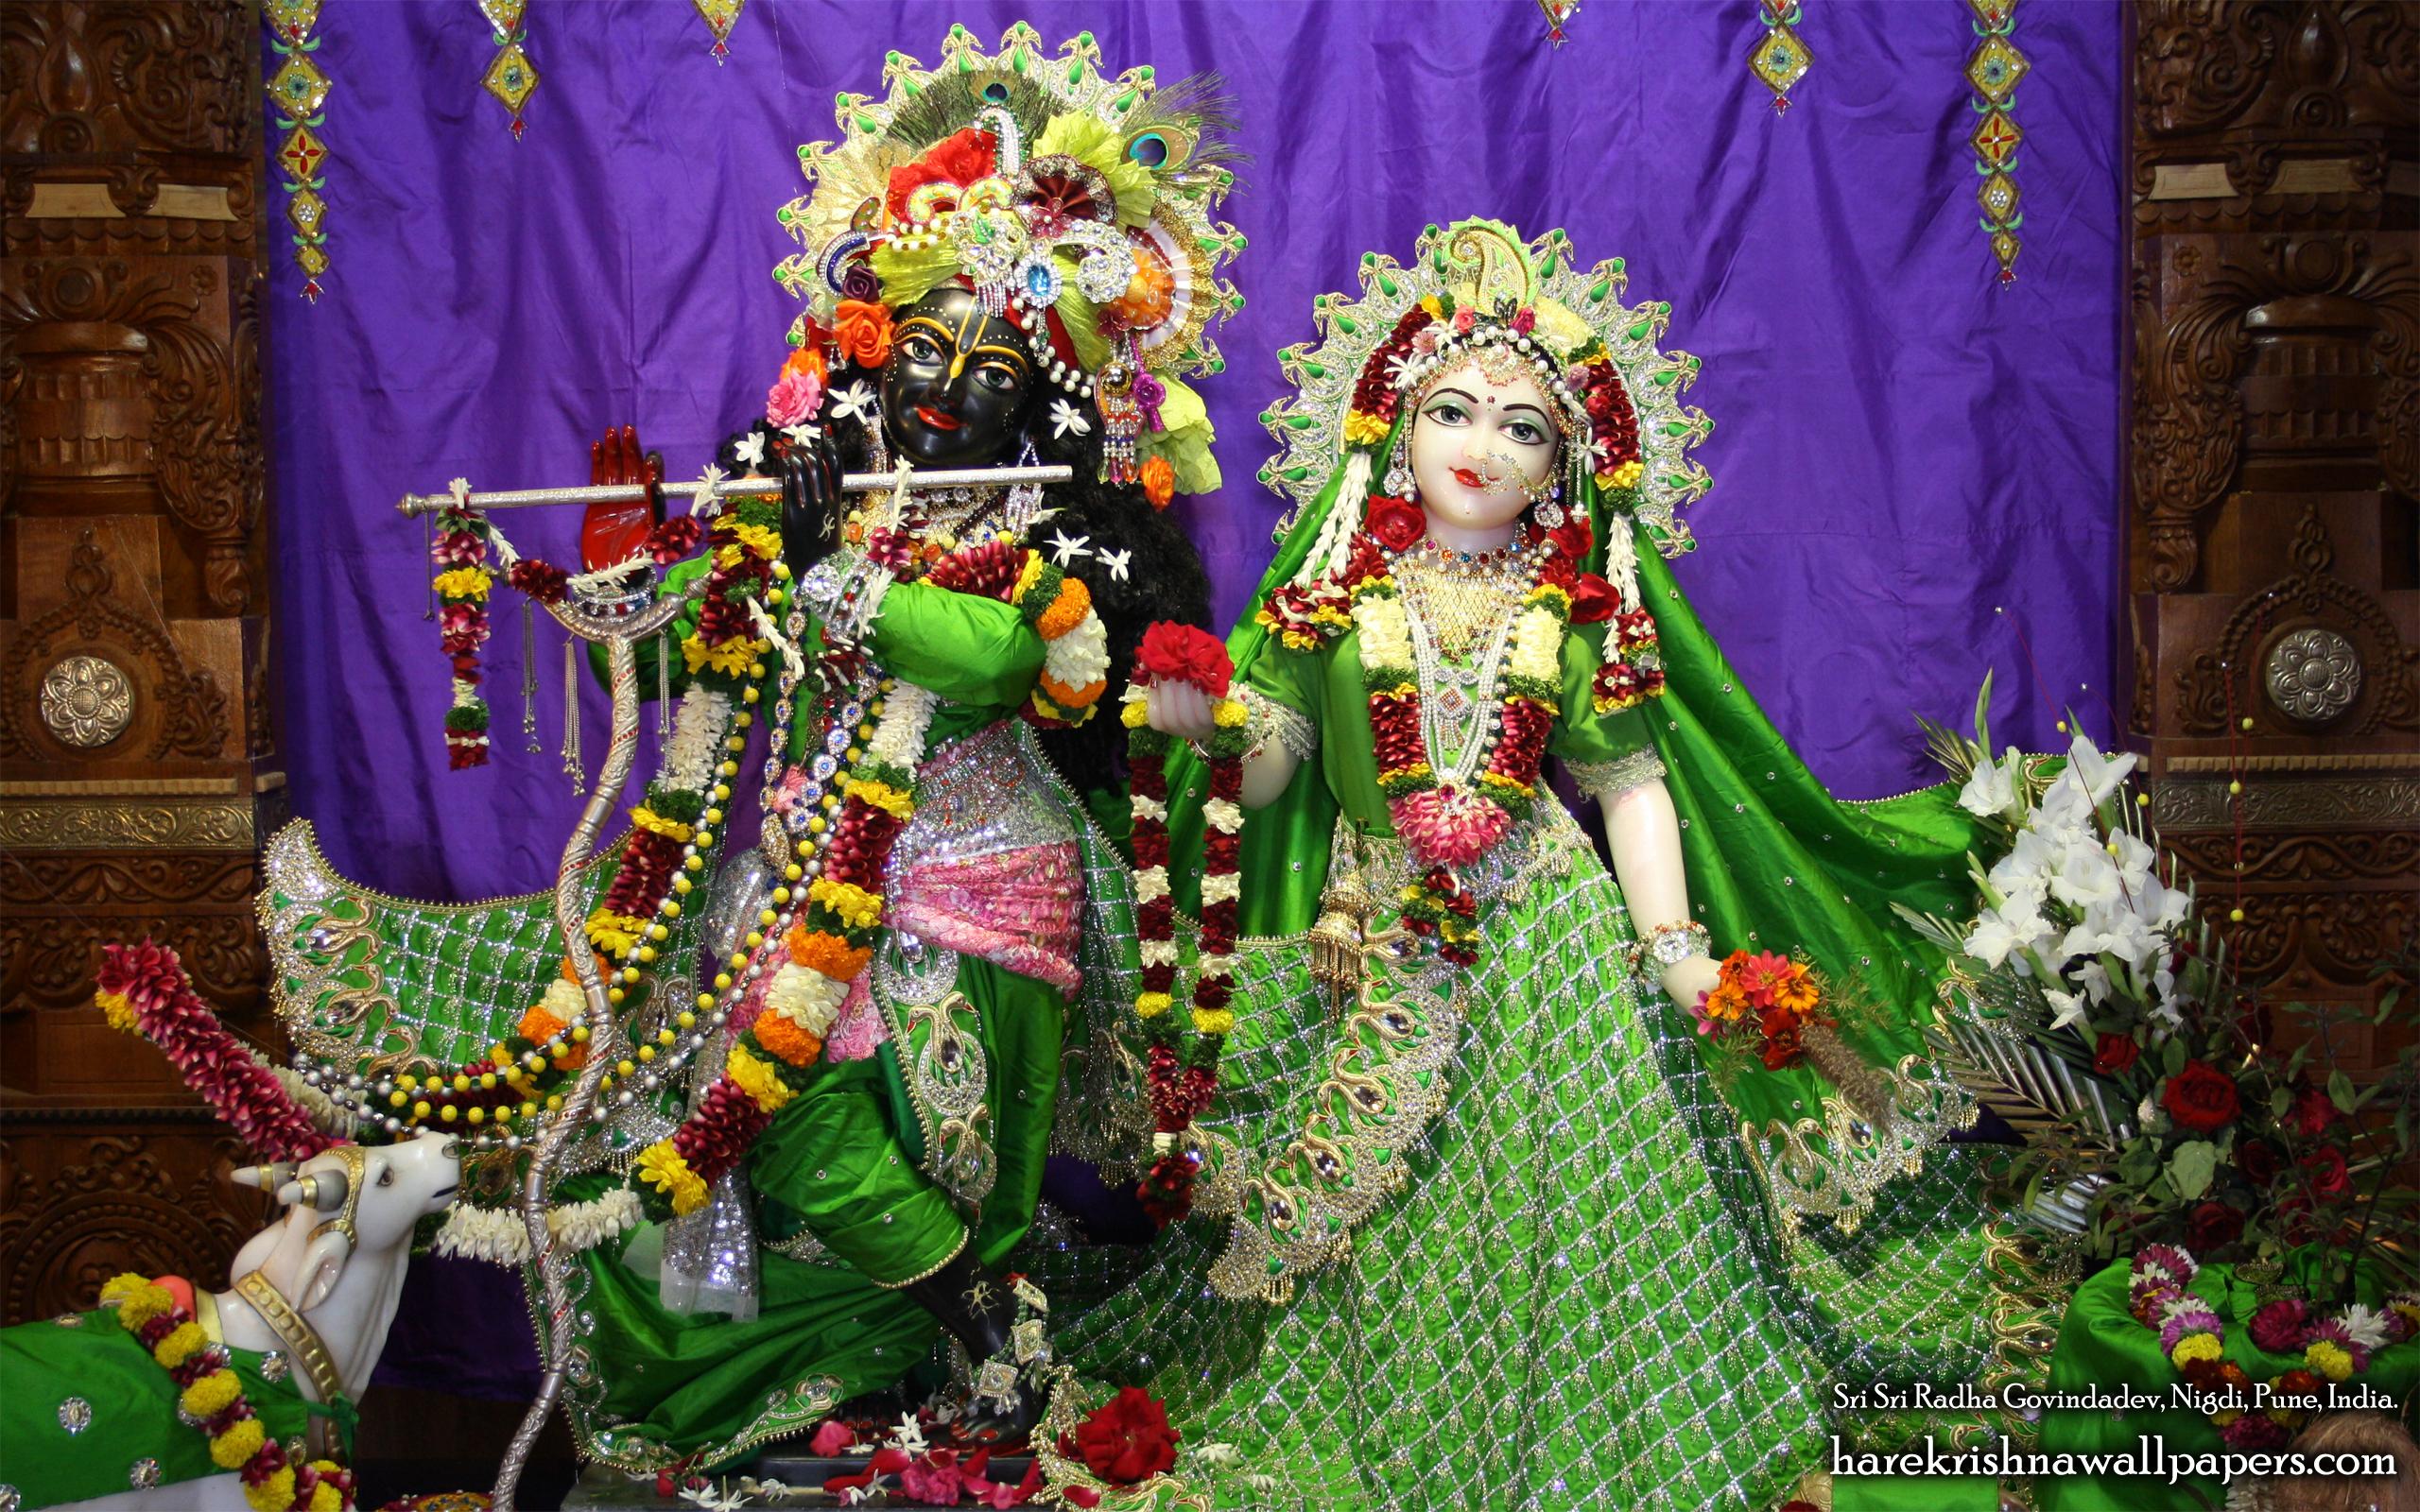 Sri Sri Radha Govind Wallpaper (034) Size 2560x1600 Download